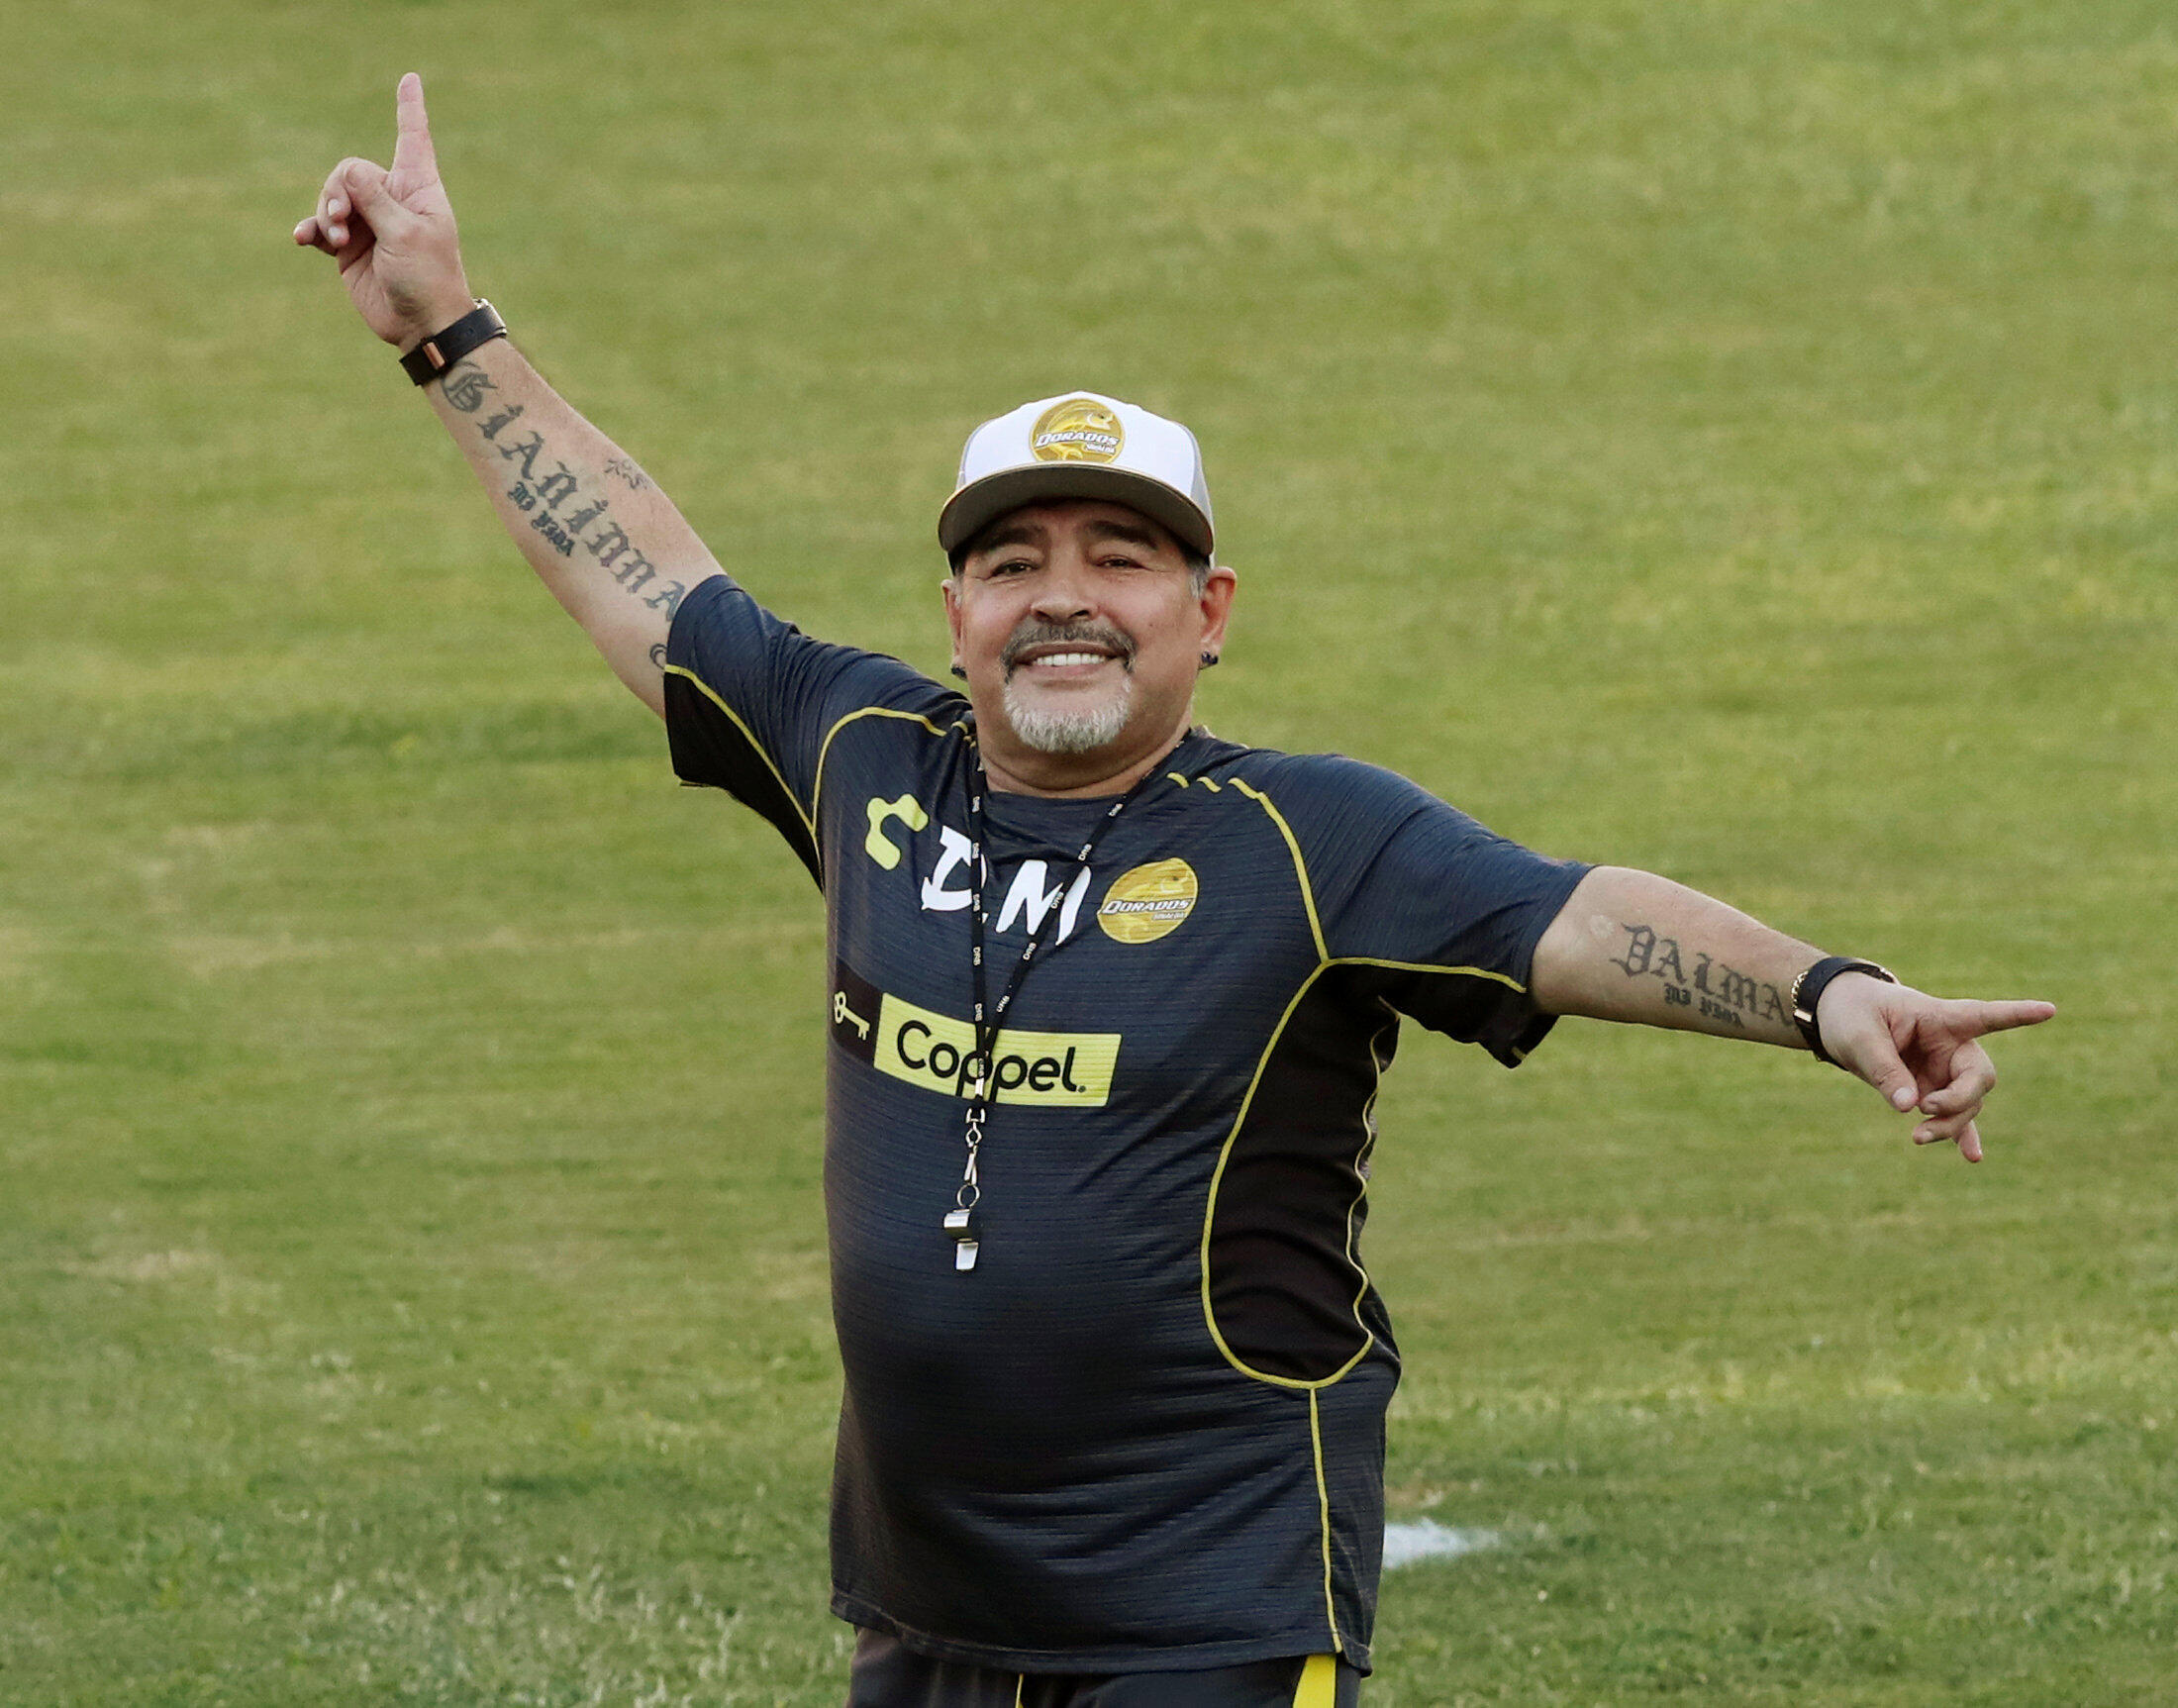 Diego Maradona was coach of the Dorados de Sinaloa in the Mexican second division, in 2018-2019